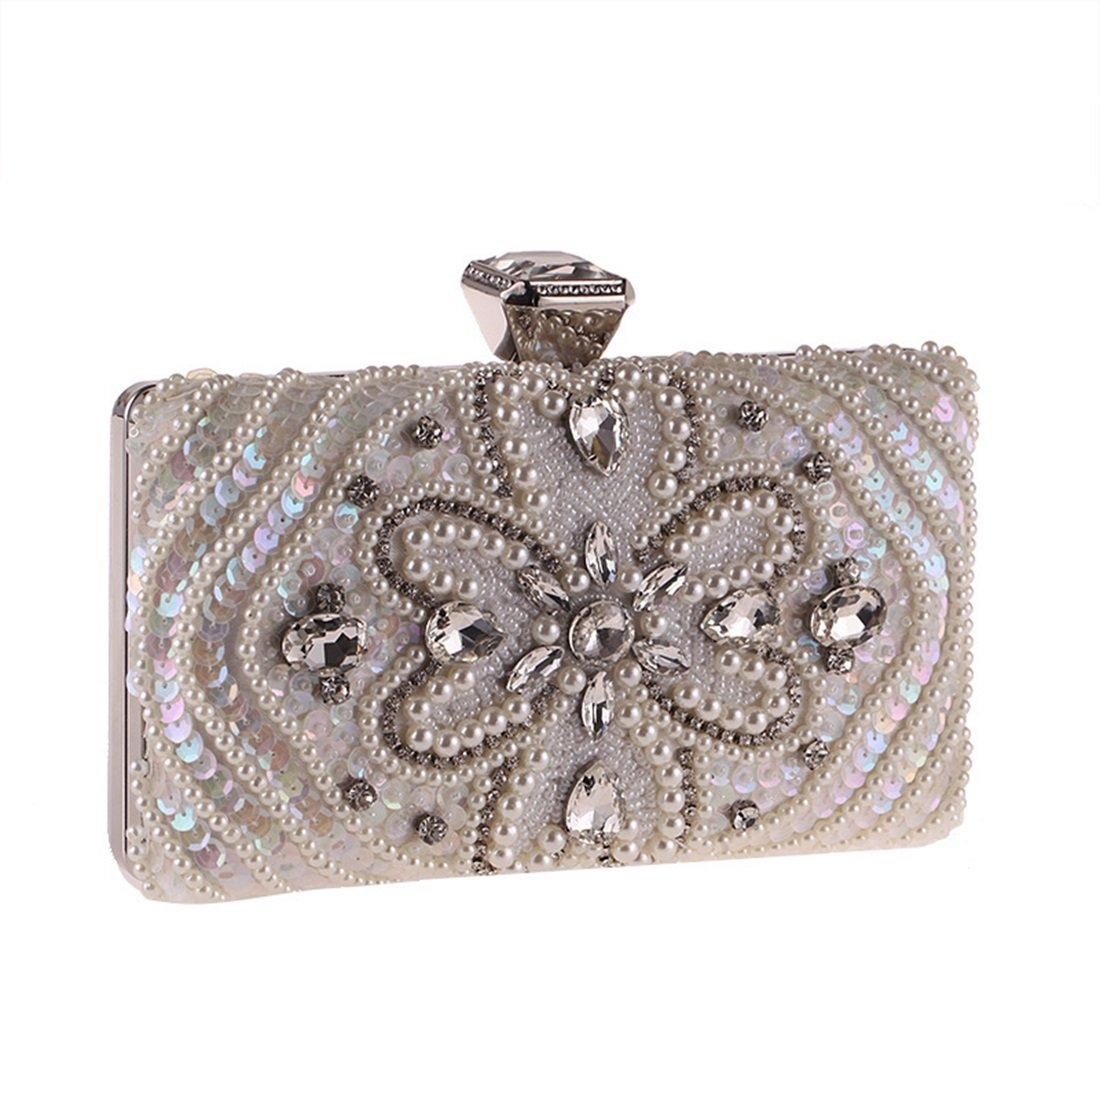 Carriemeow Womens Dress Bag Clutch Beaded Diamond-encrusted Evening Bag Wedding